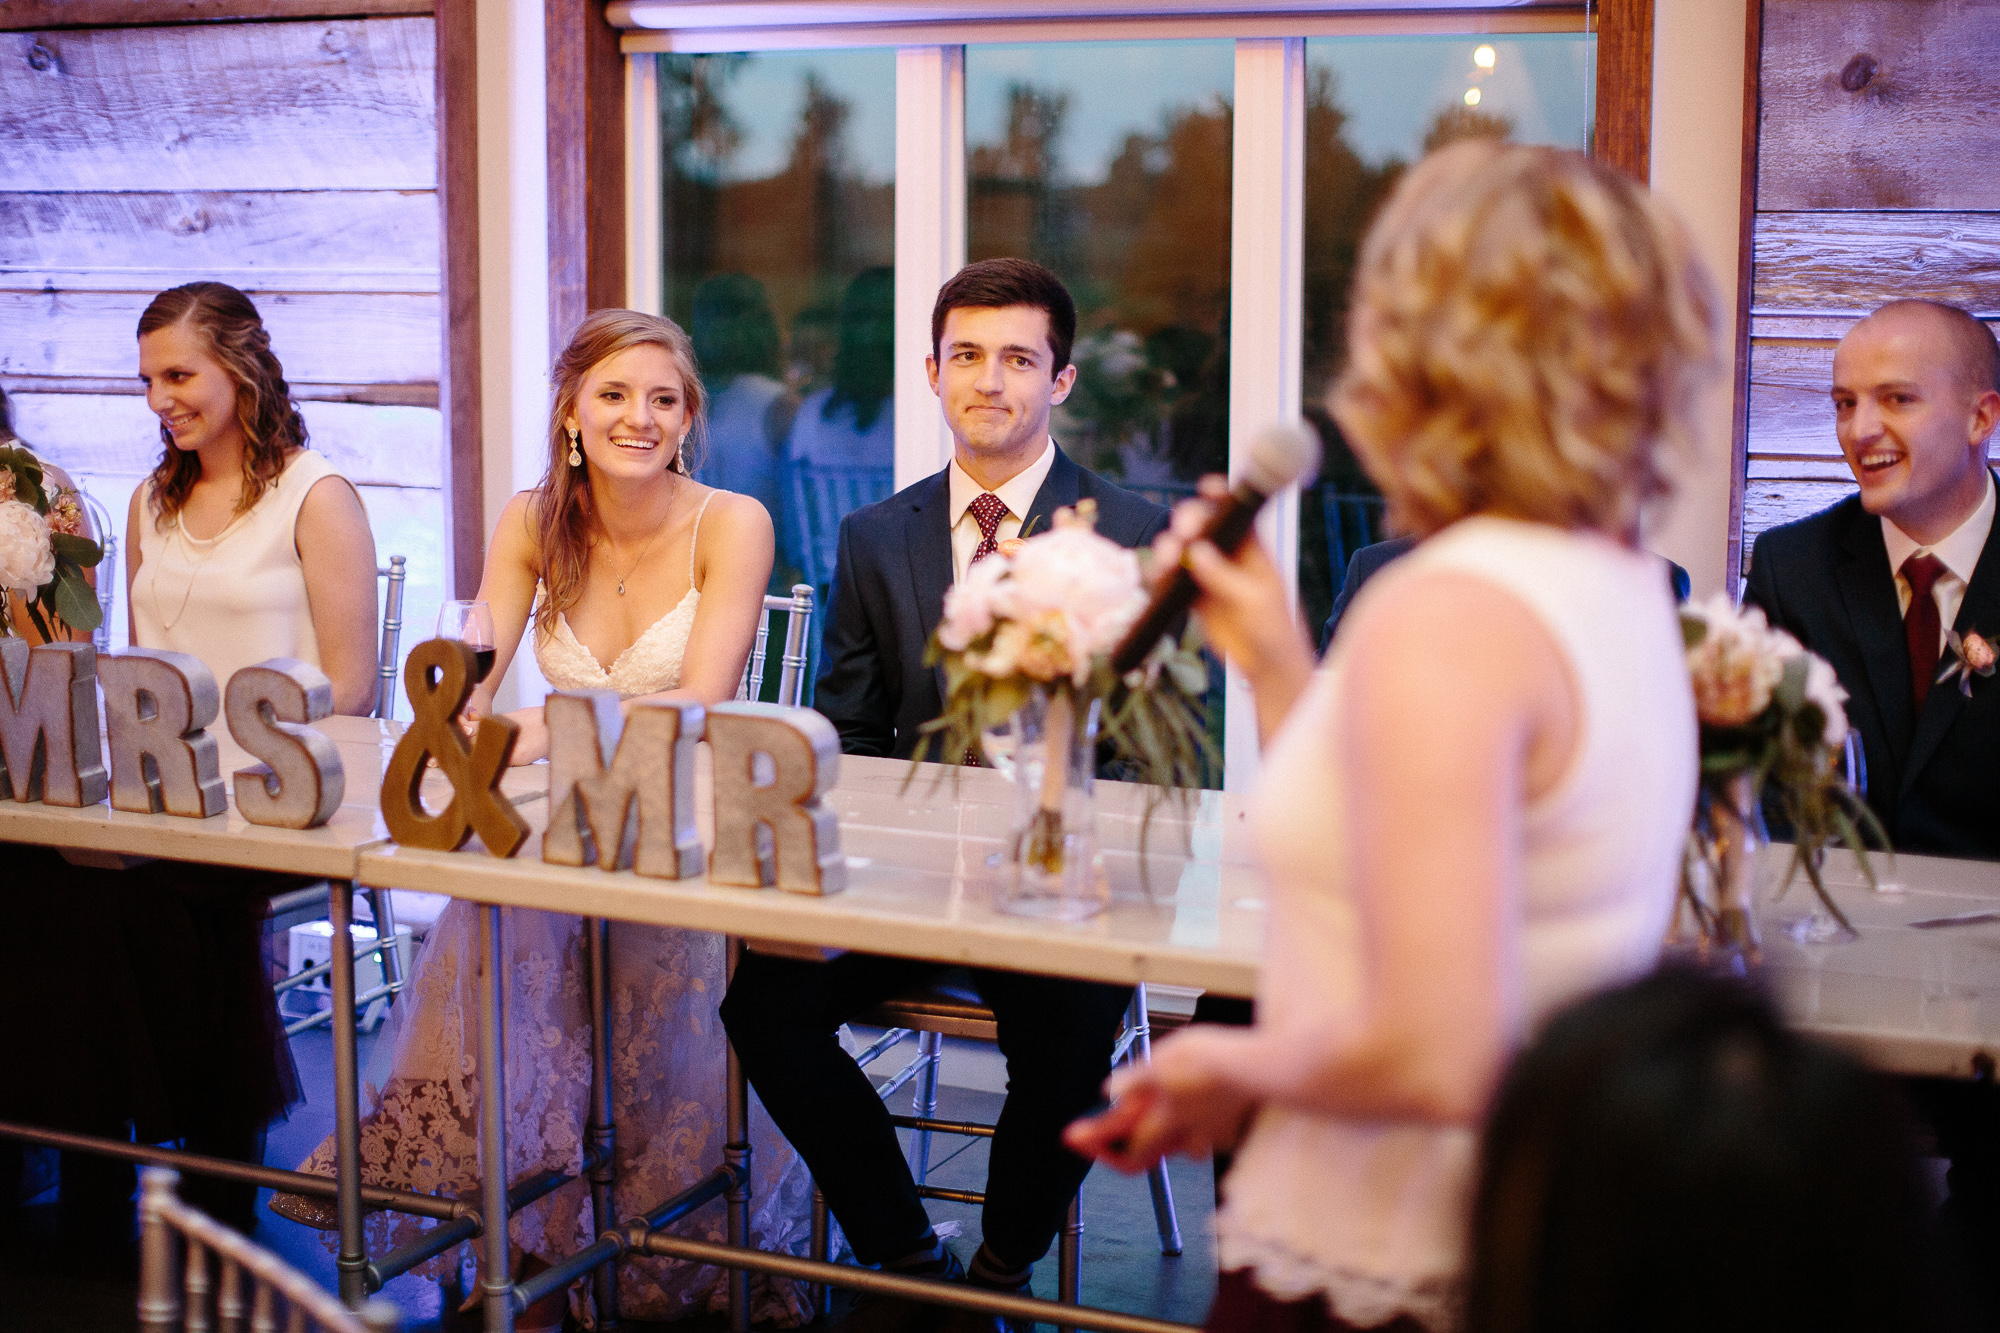 wedding-elopement-adventerous-romantic-timeless-south-dakota-blue-haven-barn-103.jpg